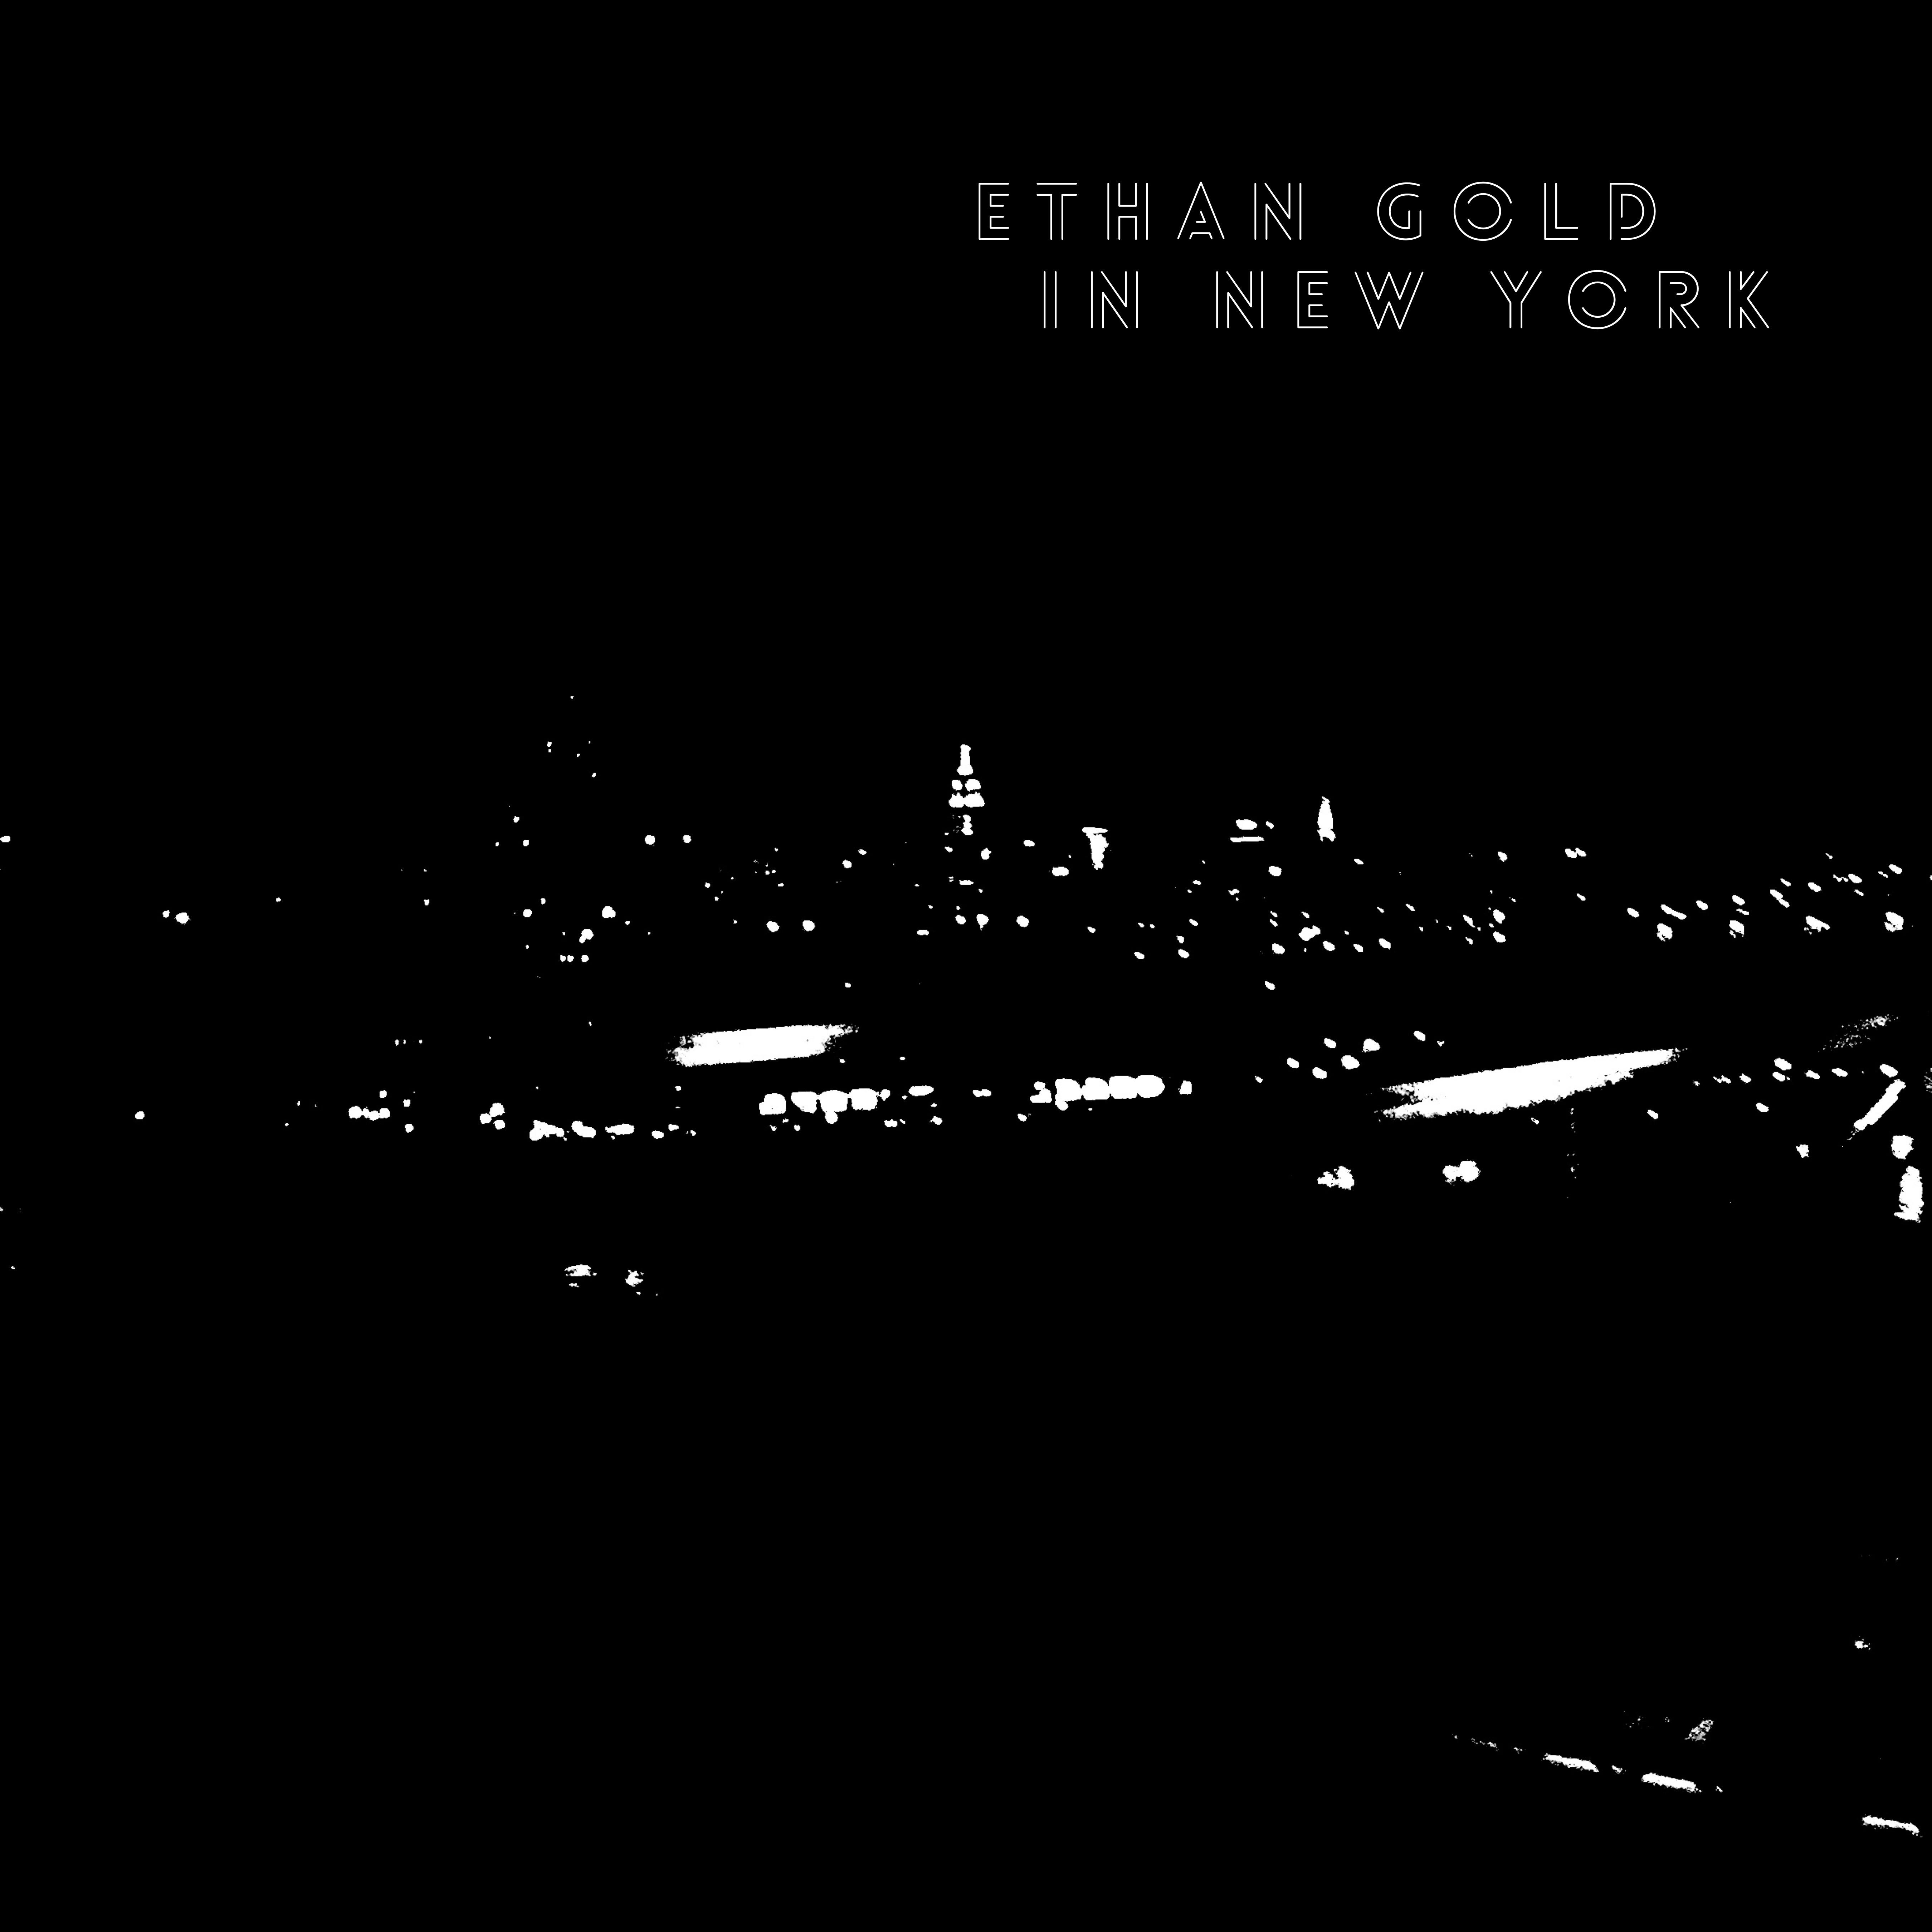 In New York Image